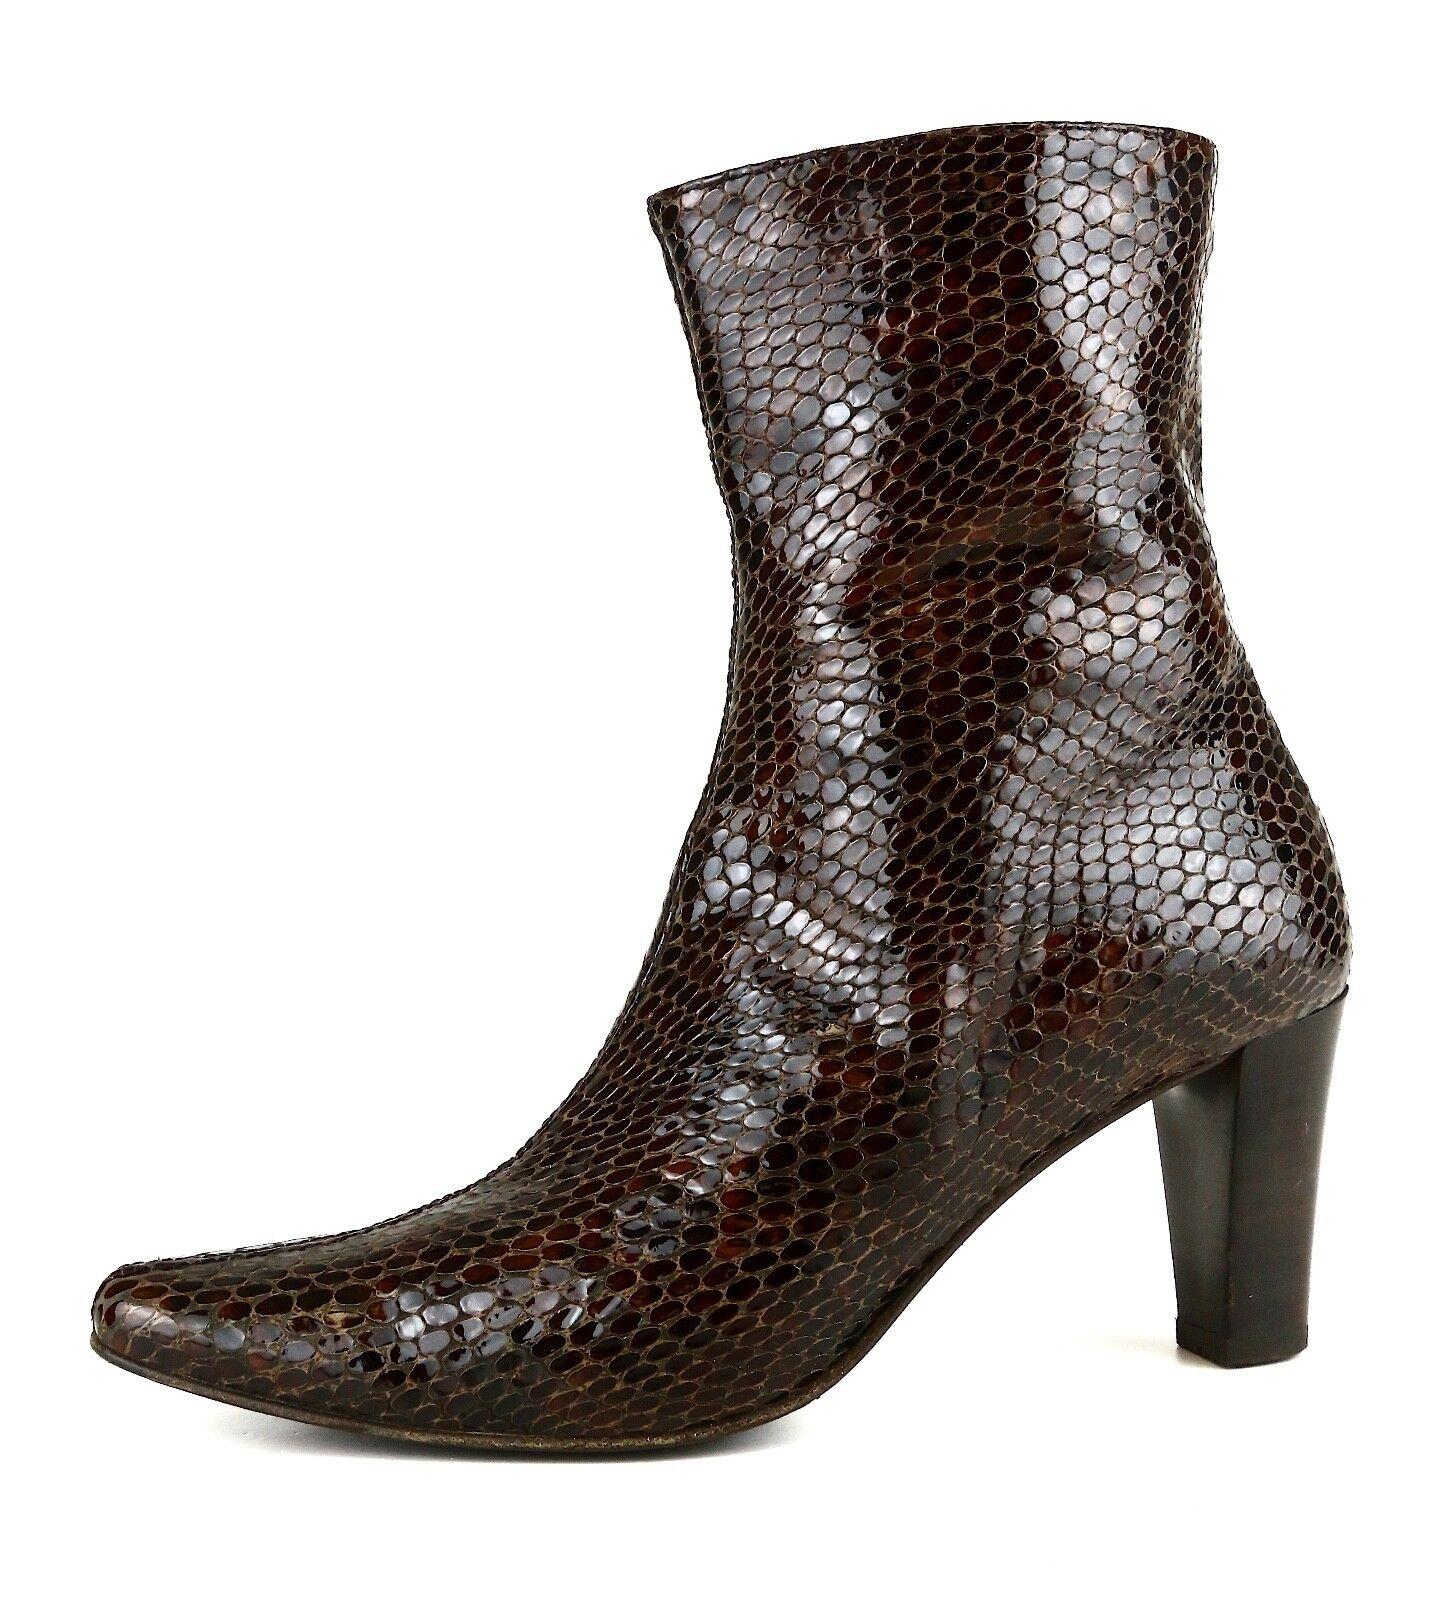 Aquatalia By Marvin K. Side Zip Leather Bootie Brown Women Sz 6 5642